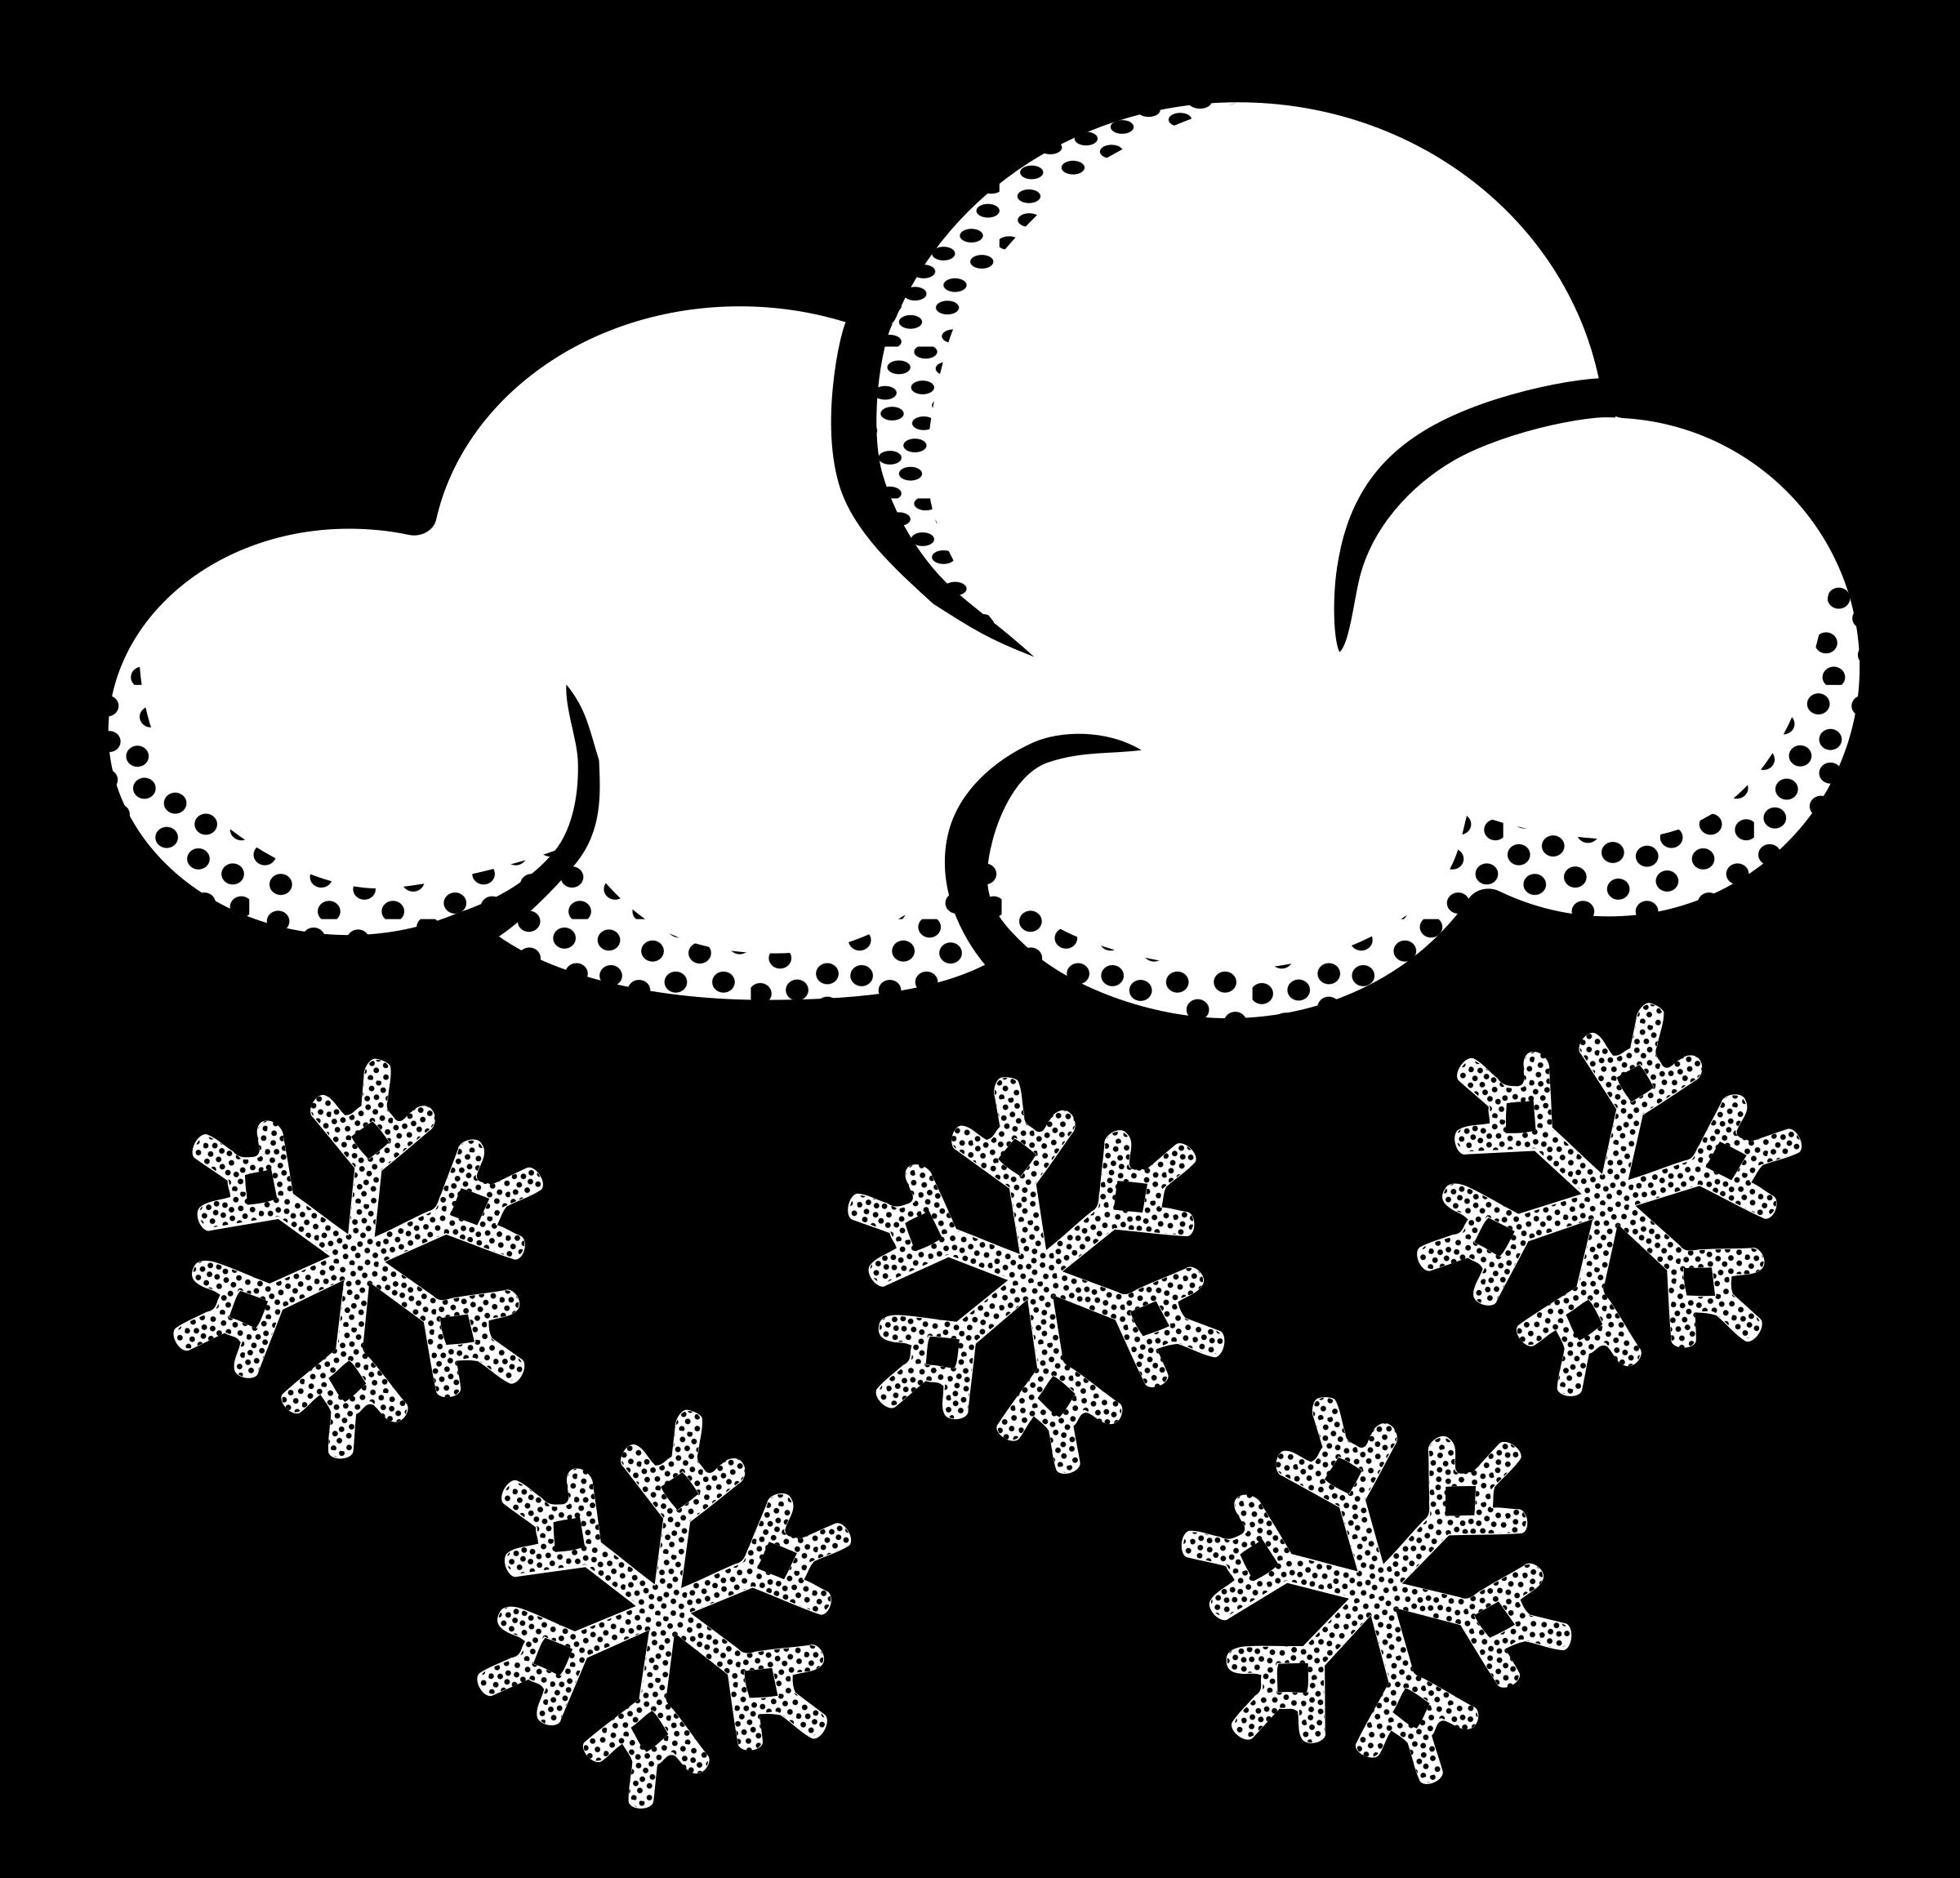 Clipart snowing banner transparent download Snow cloud clipart 2 - Cliparting.com banner transparent download